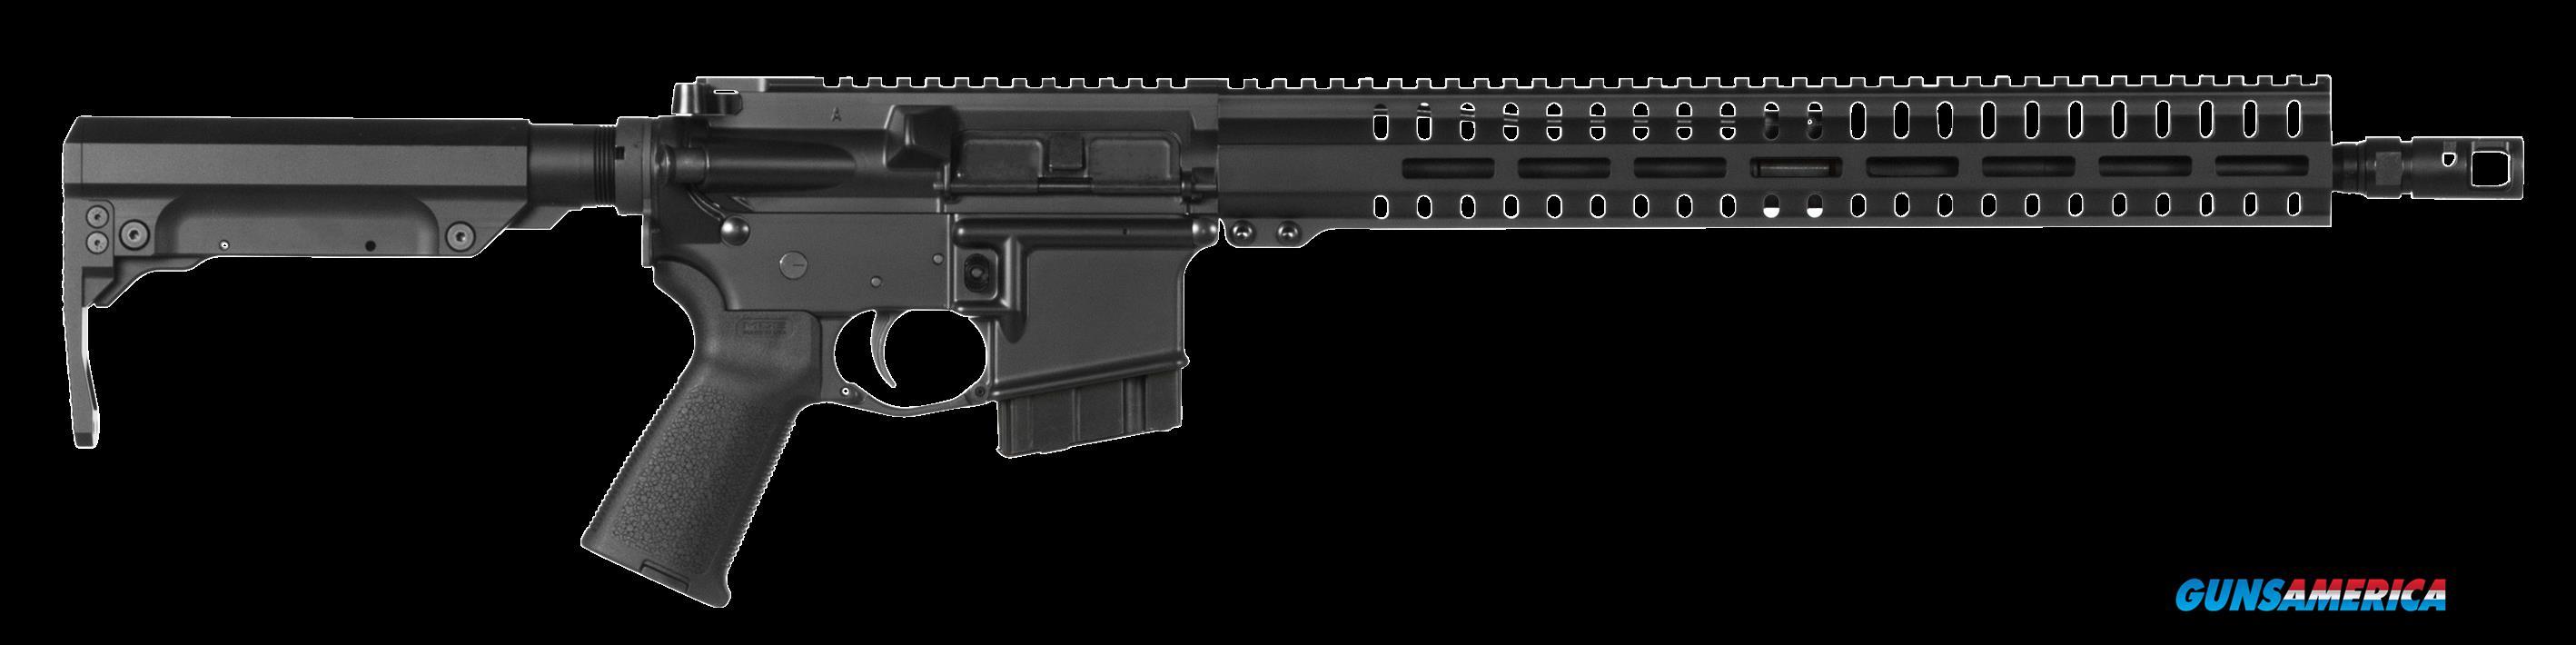 Cmmg Resolute 200, Cmmg 35a5f62     Resolute 200 Mk4    350lgd 16 Blk  Guns > Pistols > 1911 Pistol Copies (non-Colt)